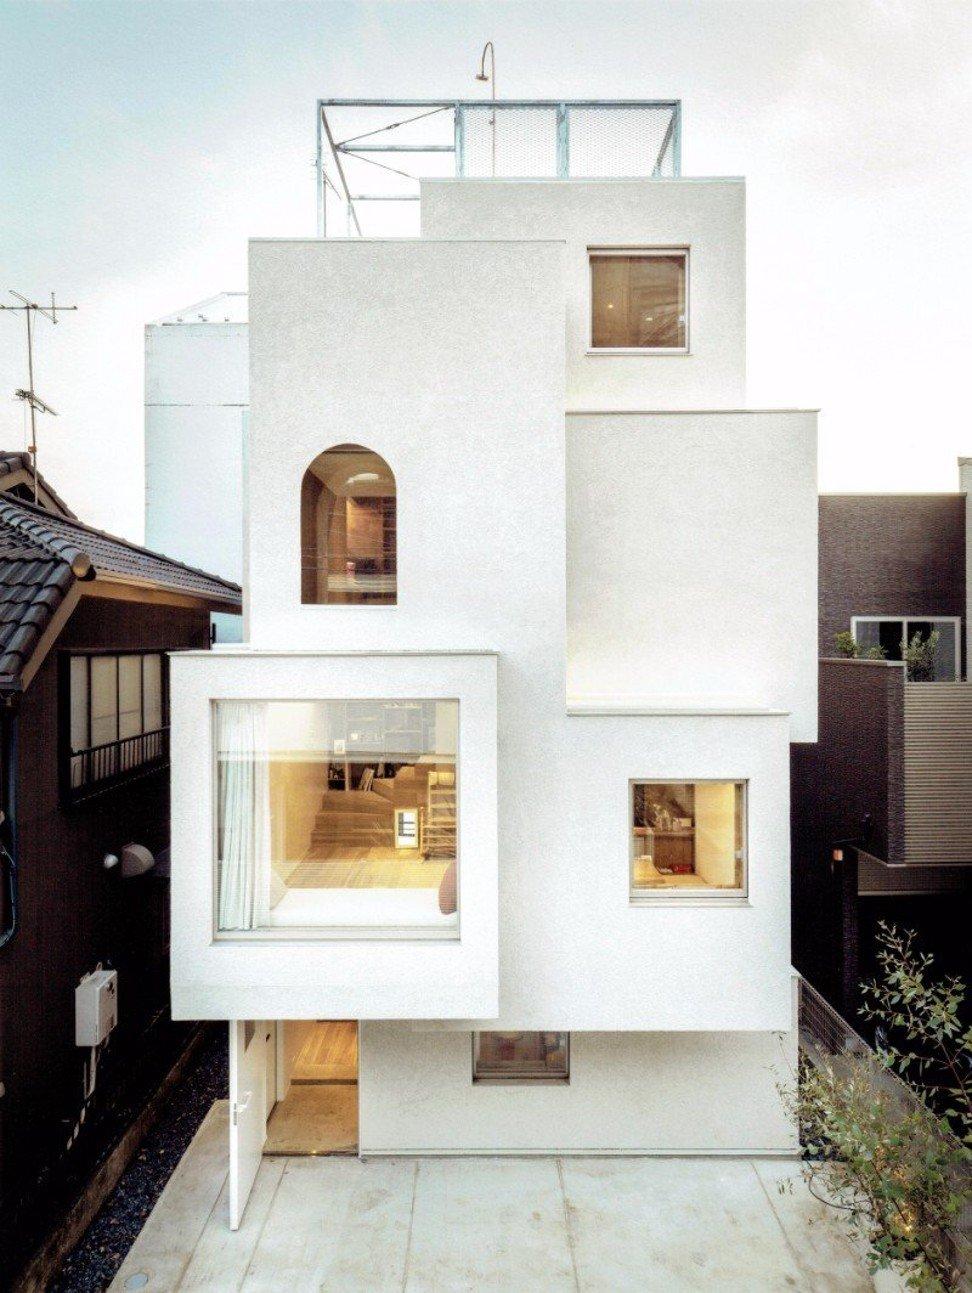 11 most beautiful new homes around the world   Style Magazine ...